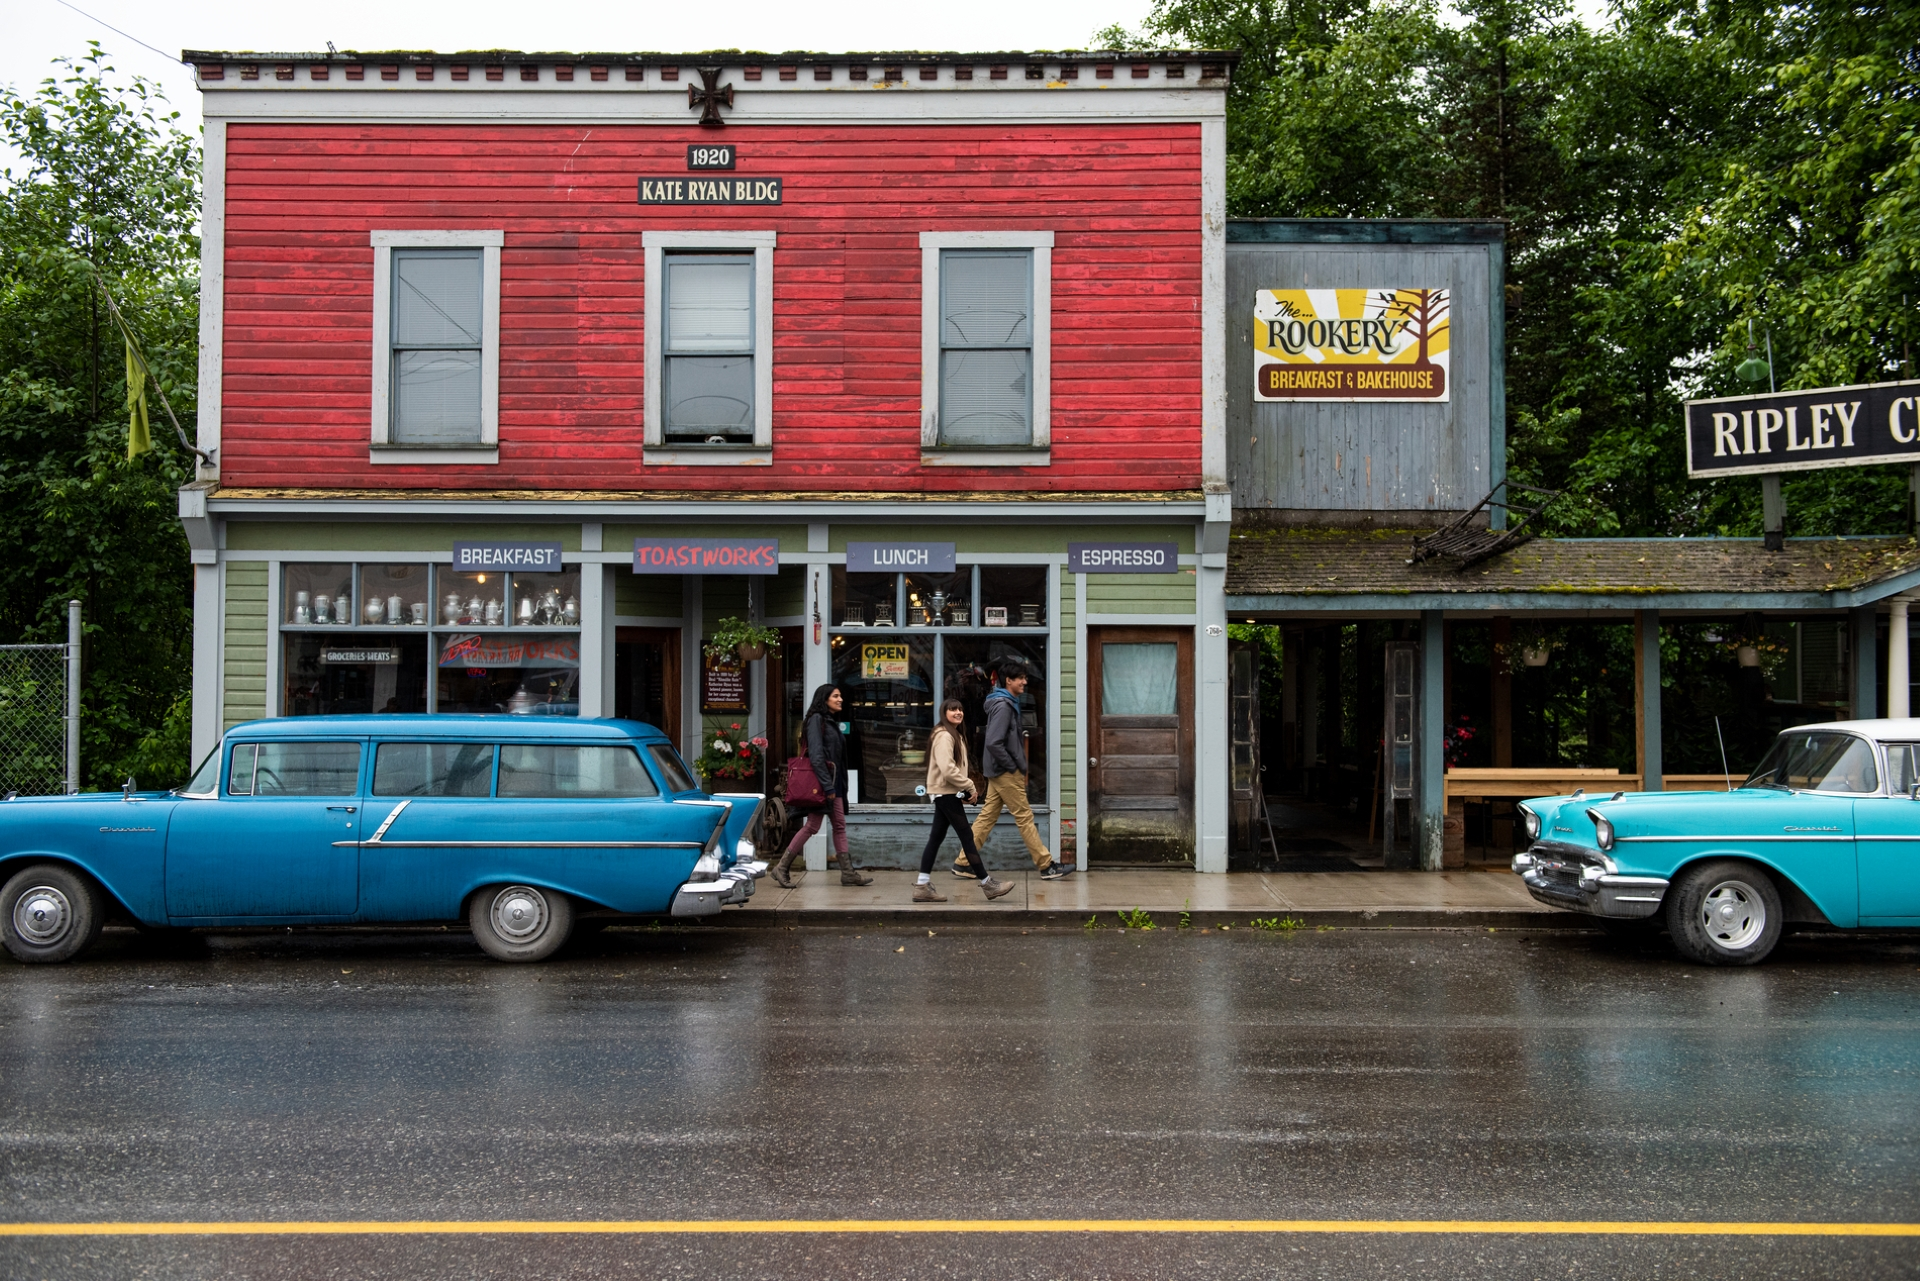 Family walking through the town of Stewart | 6ix Sigma